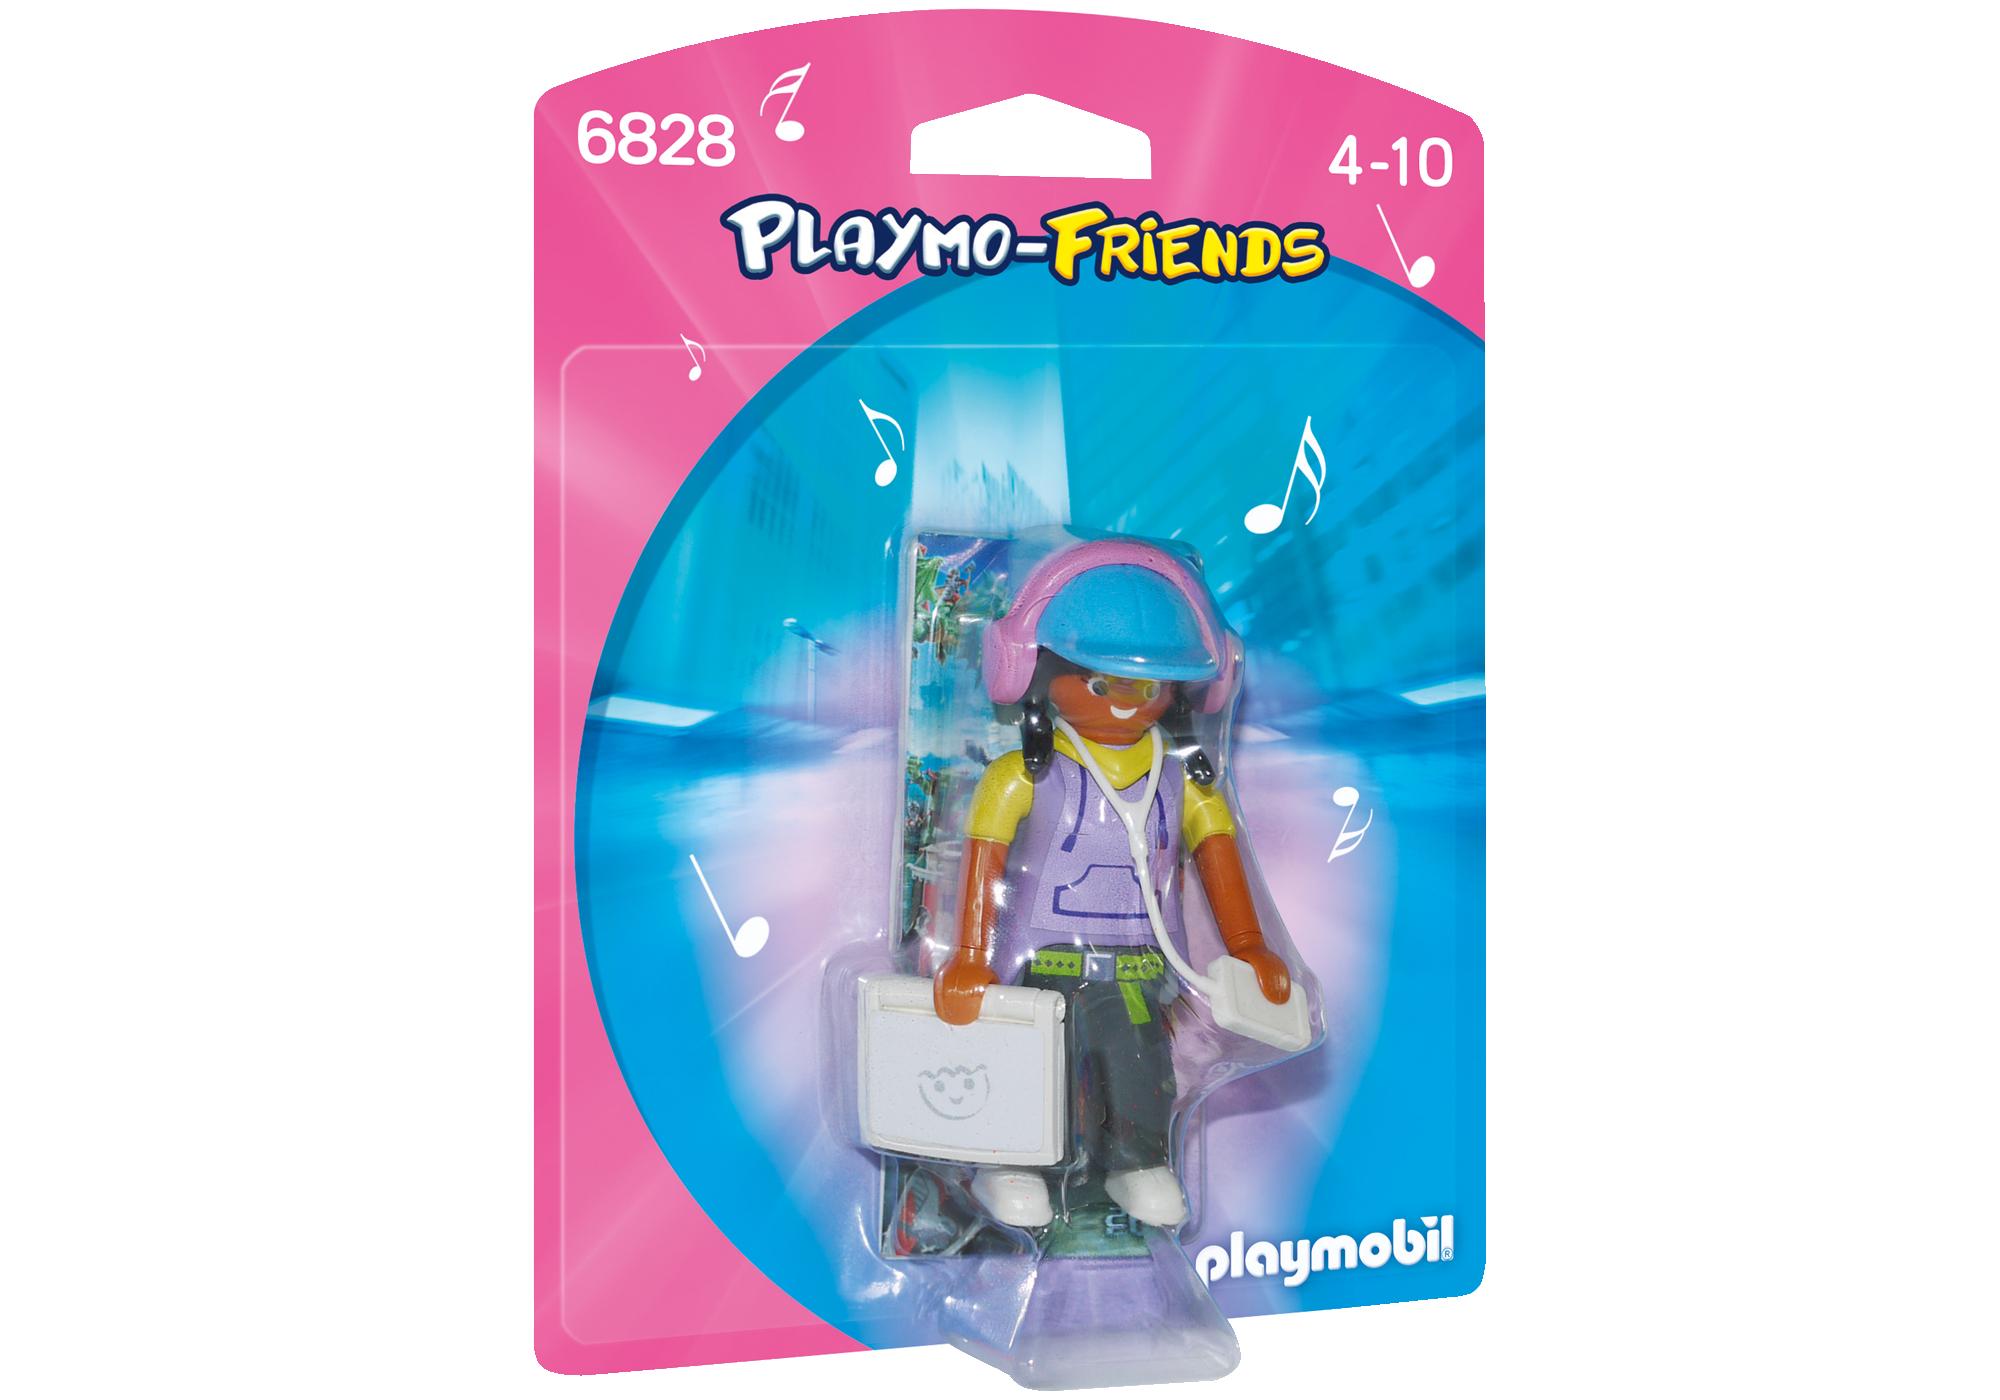 http://media.playmobil.com/i/playmobil/6828_product_box_front